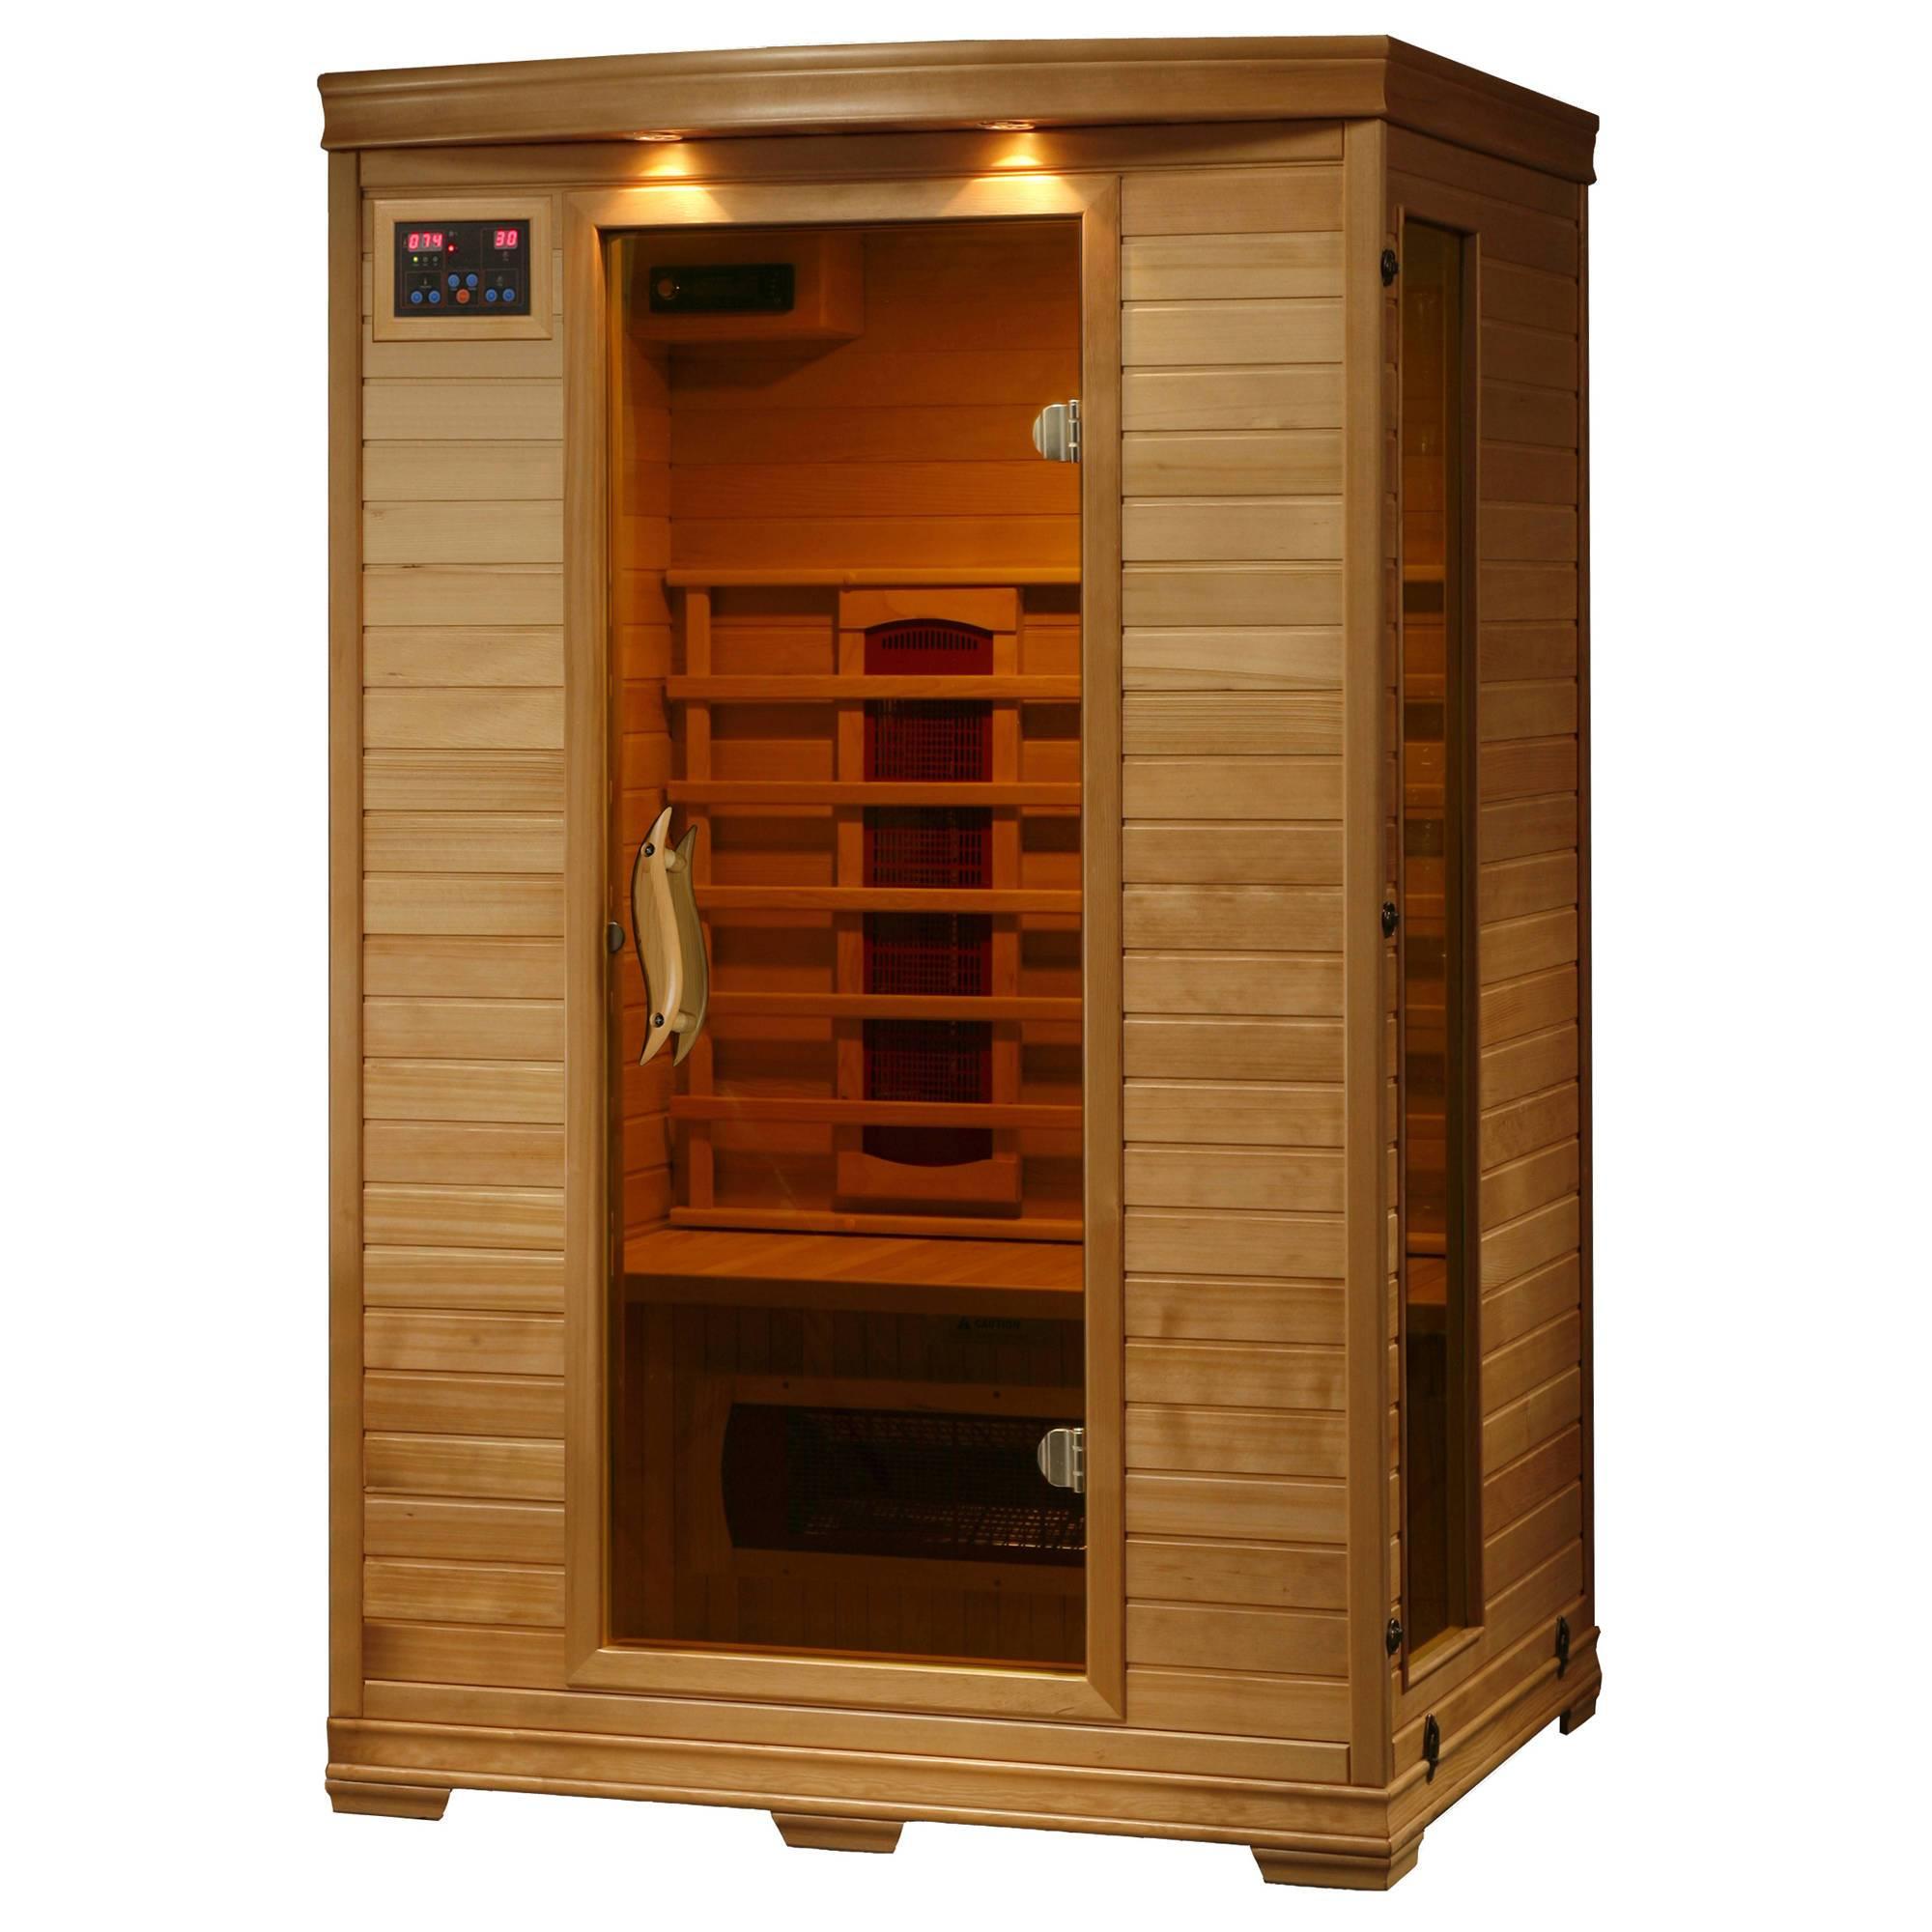 coronado-sa2409-2-person-hemlock-deluxe-infrared-sauna